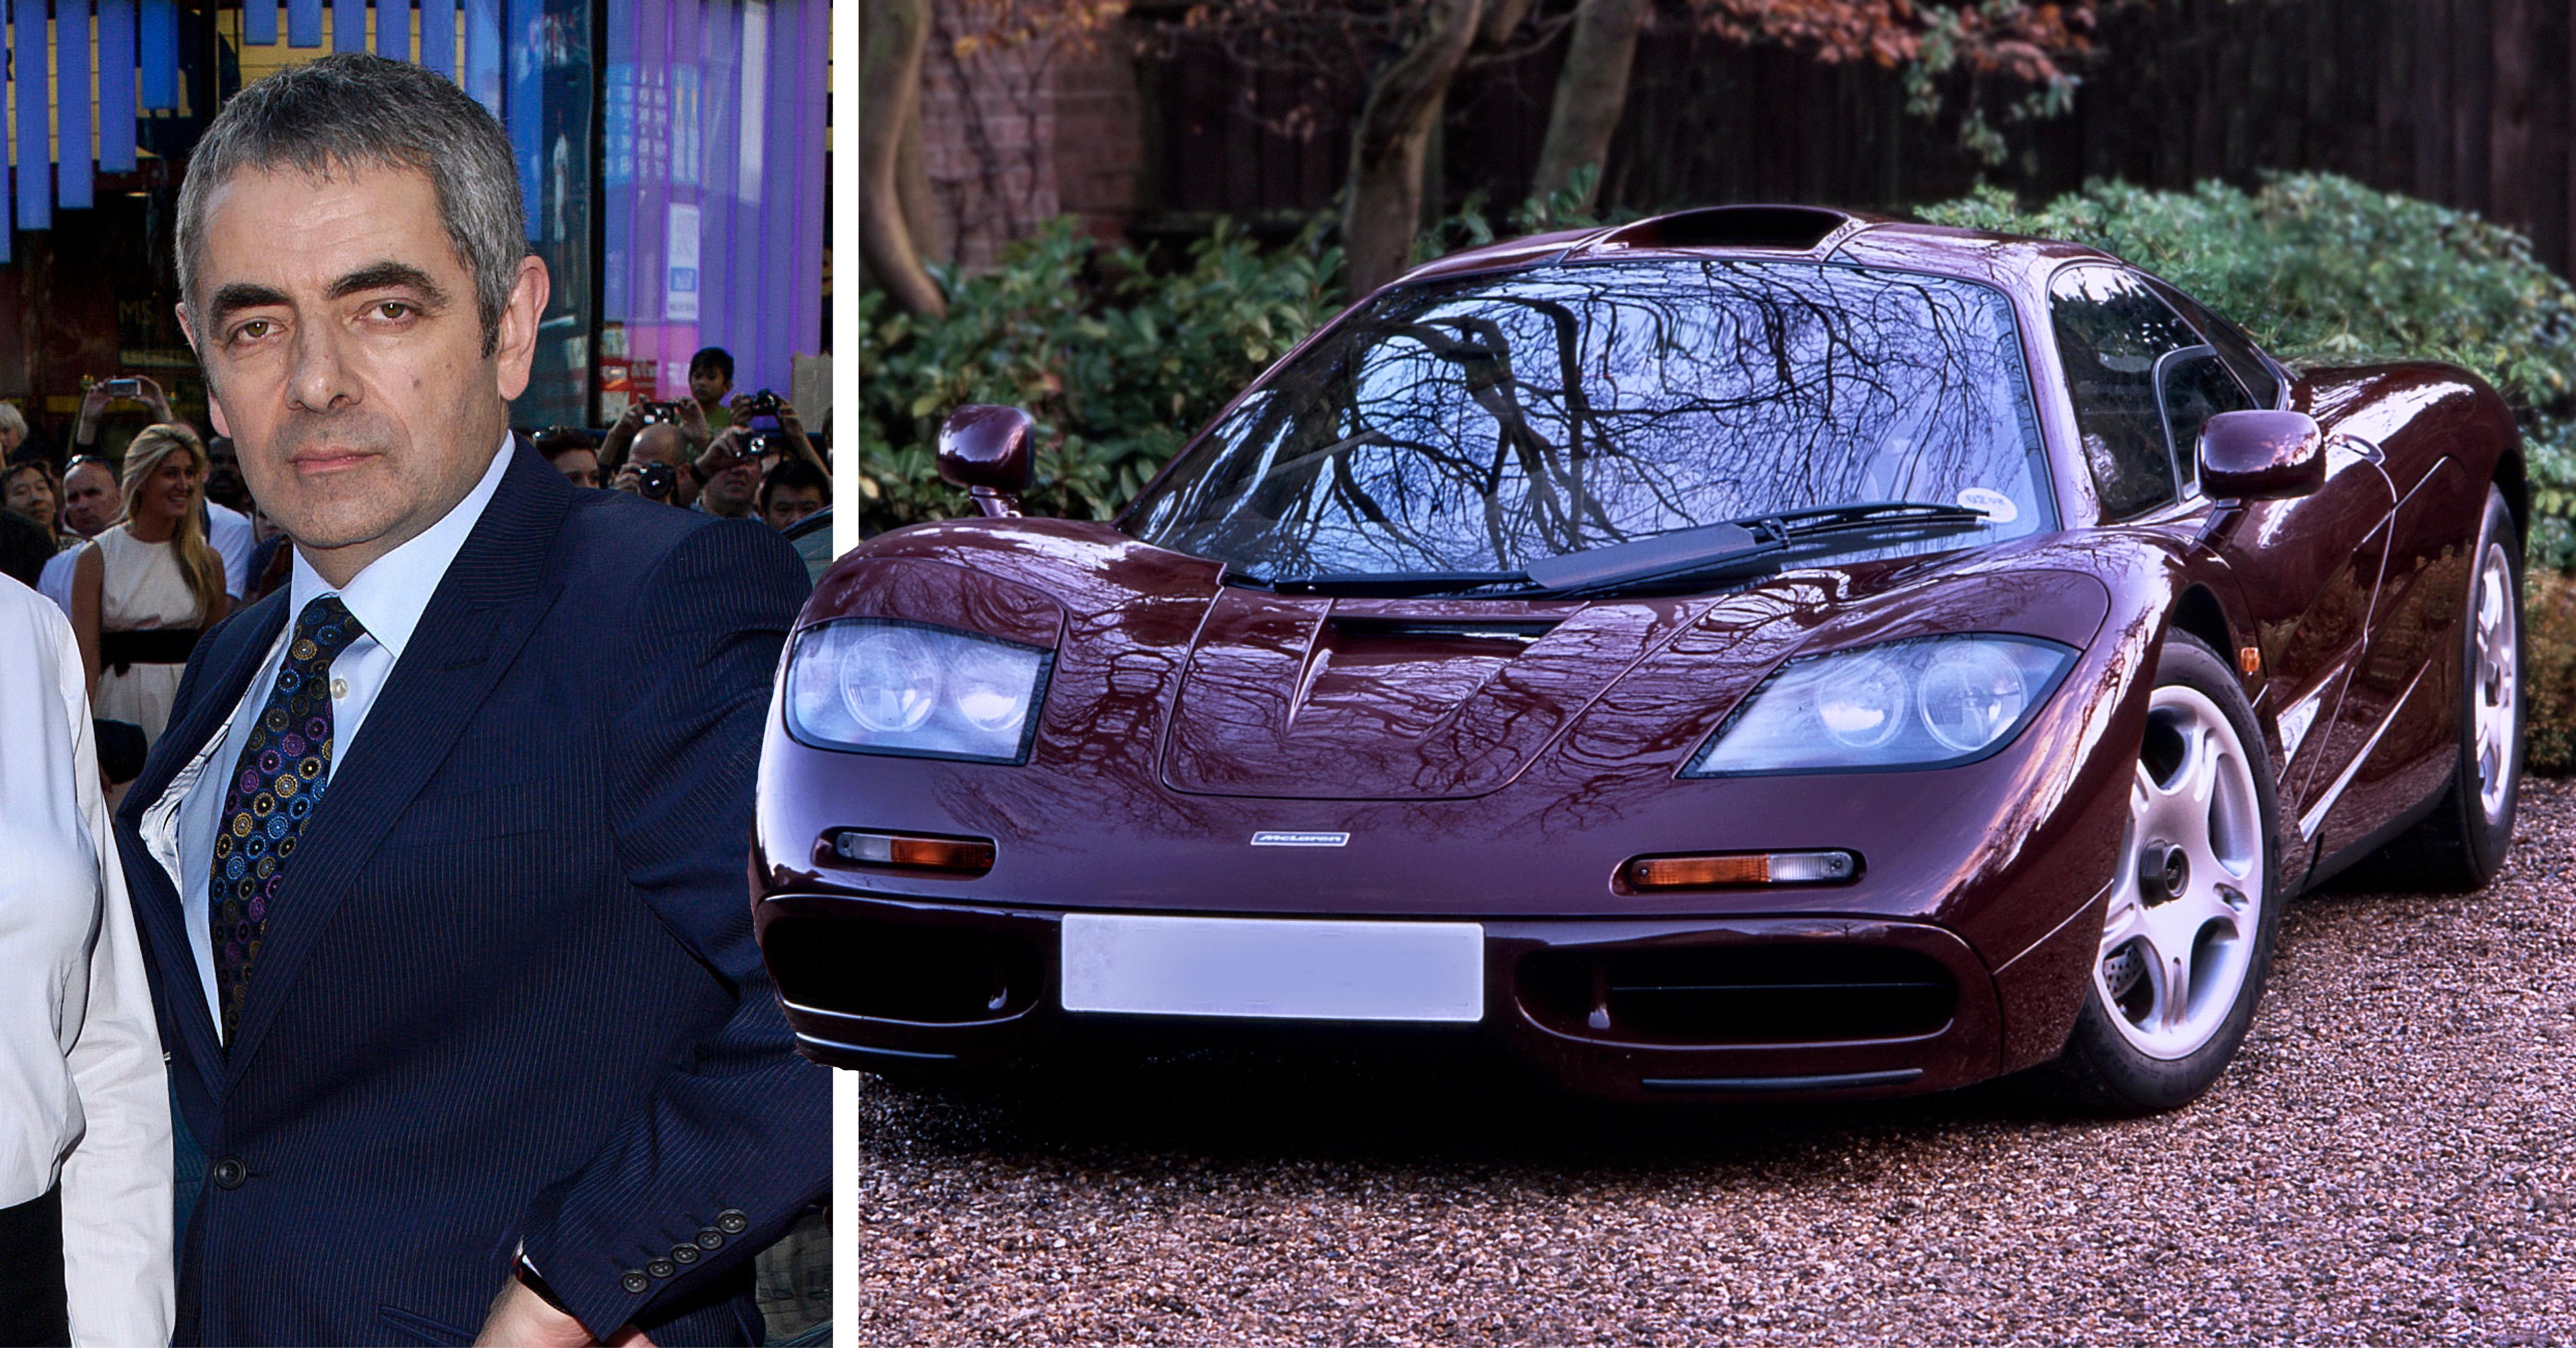 Mr bean saljer superlyxiga sportbilen for 100 miljoner